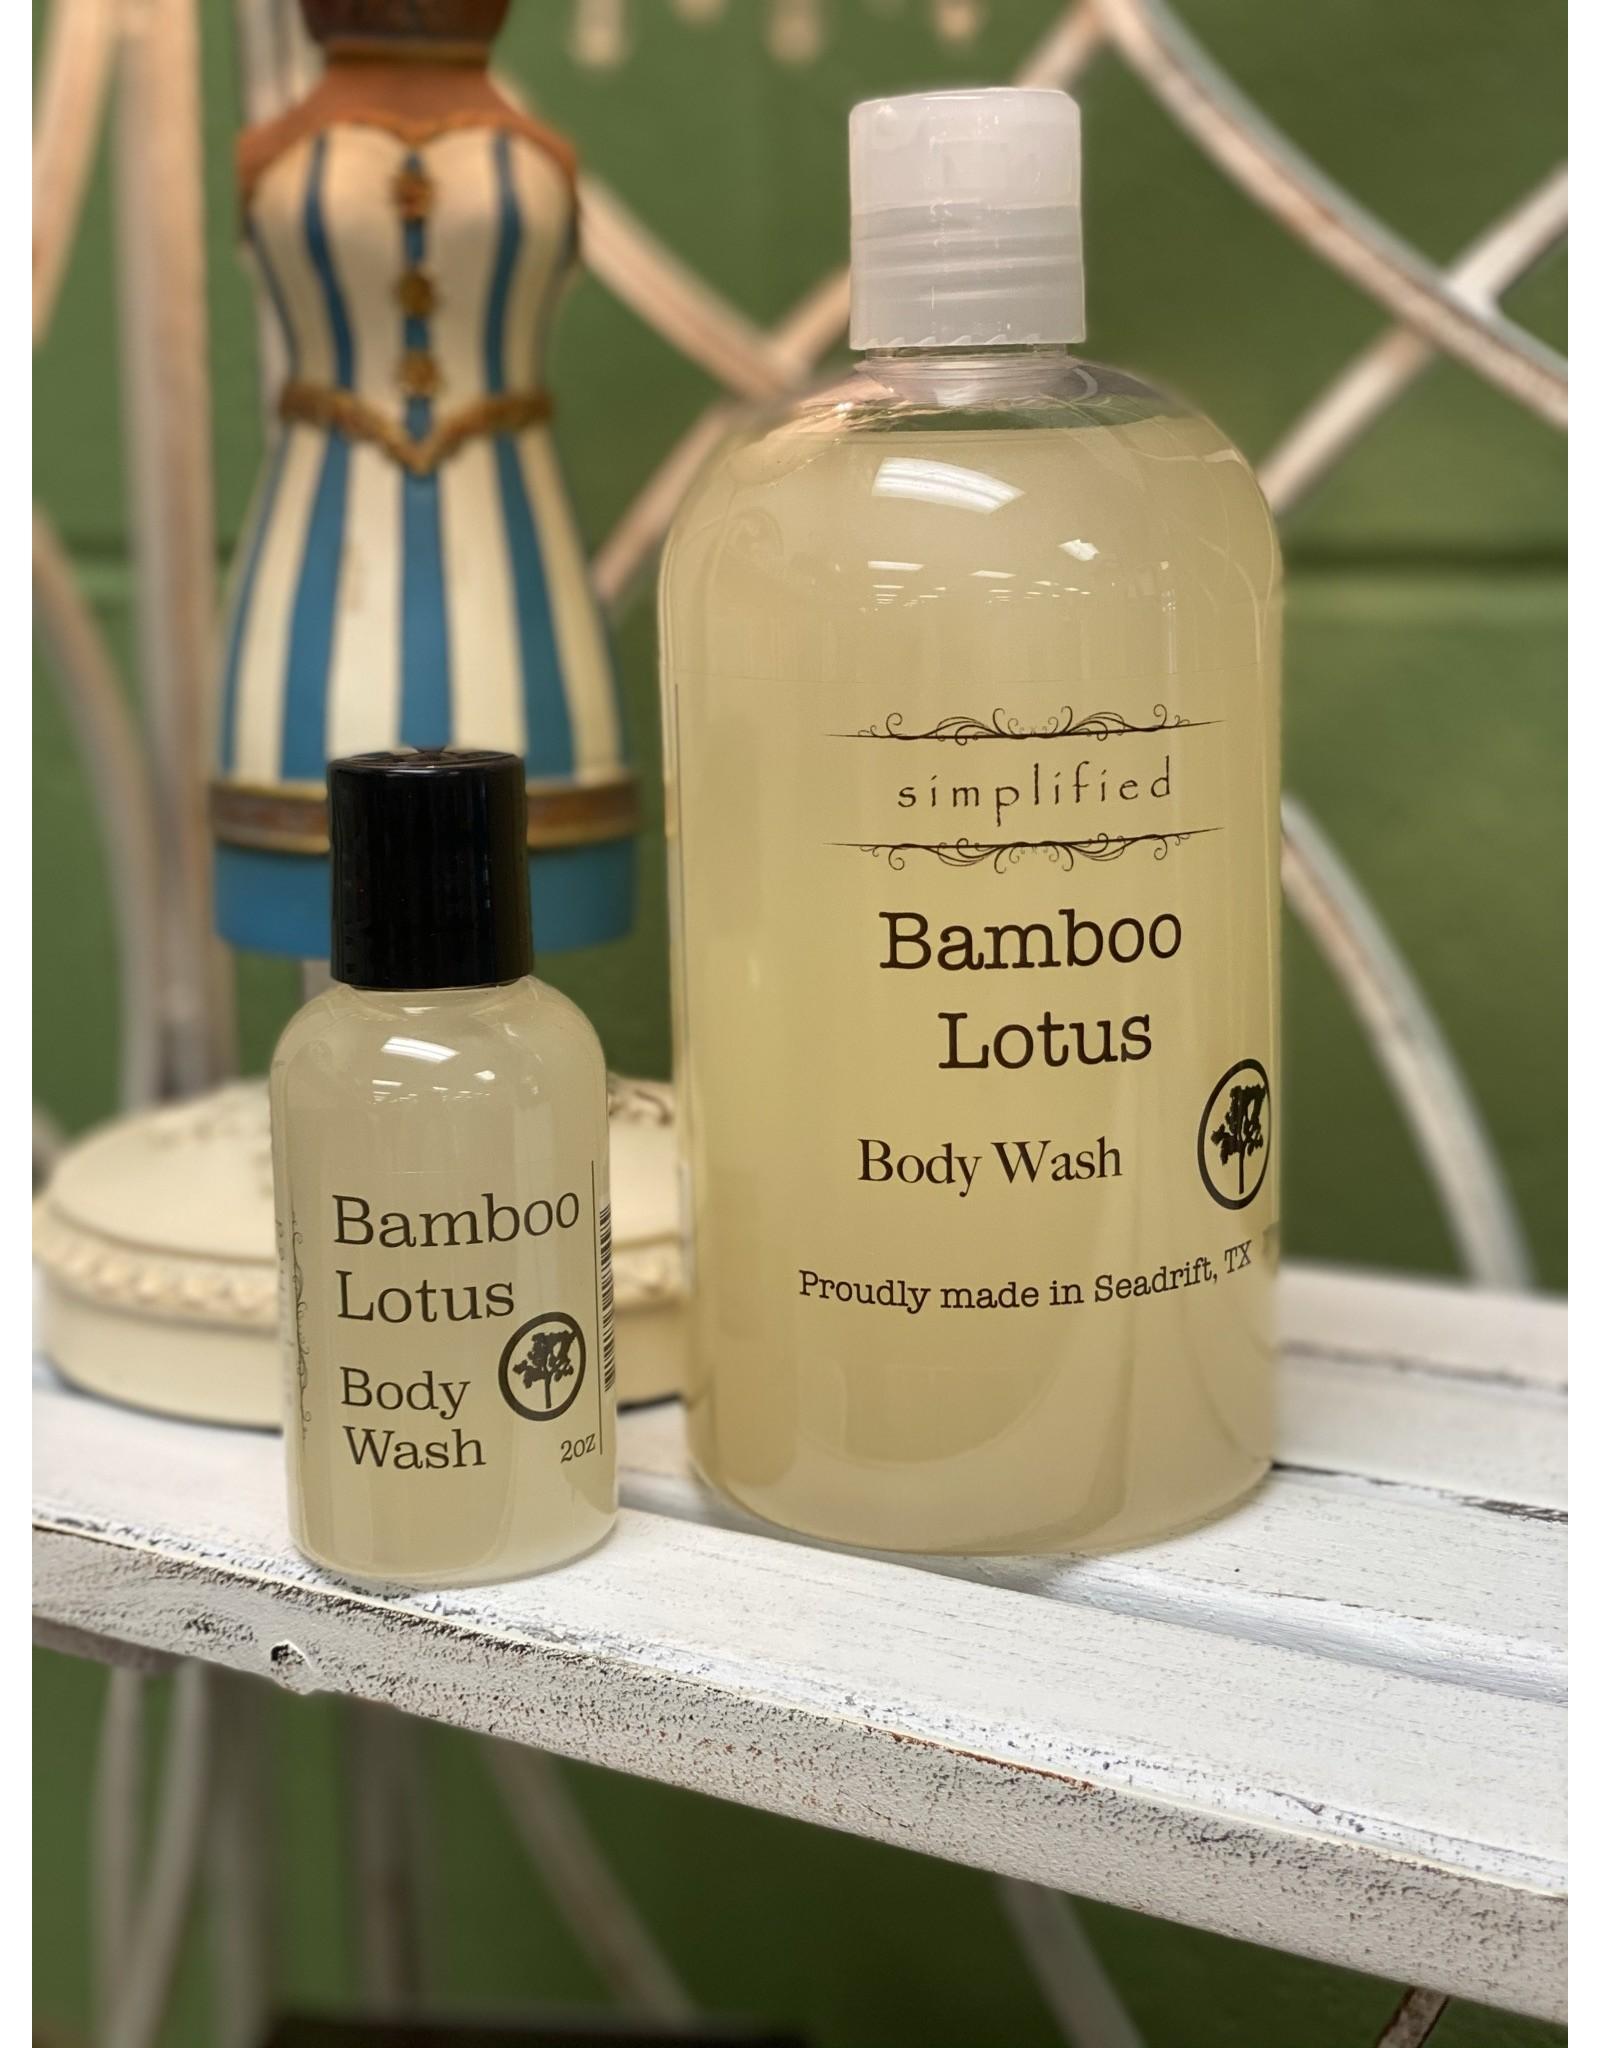 Bamboo Lotus Body Wash 2oz